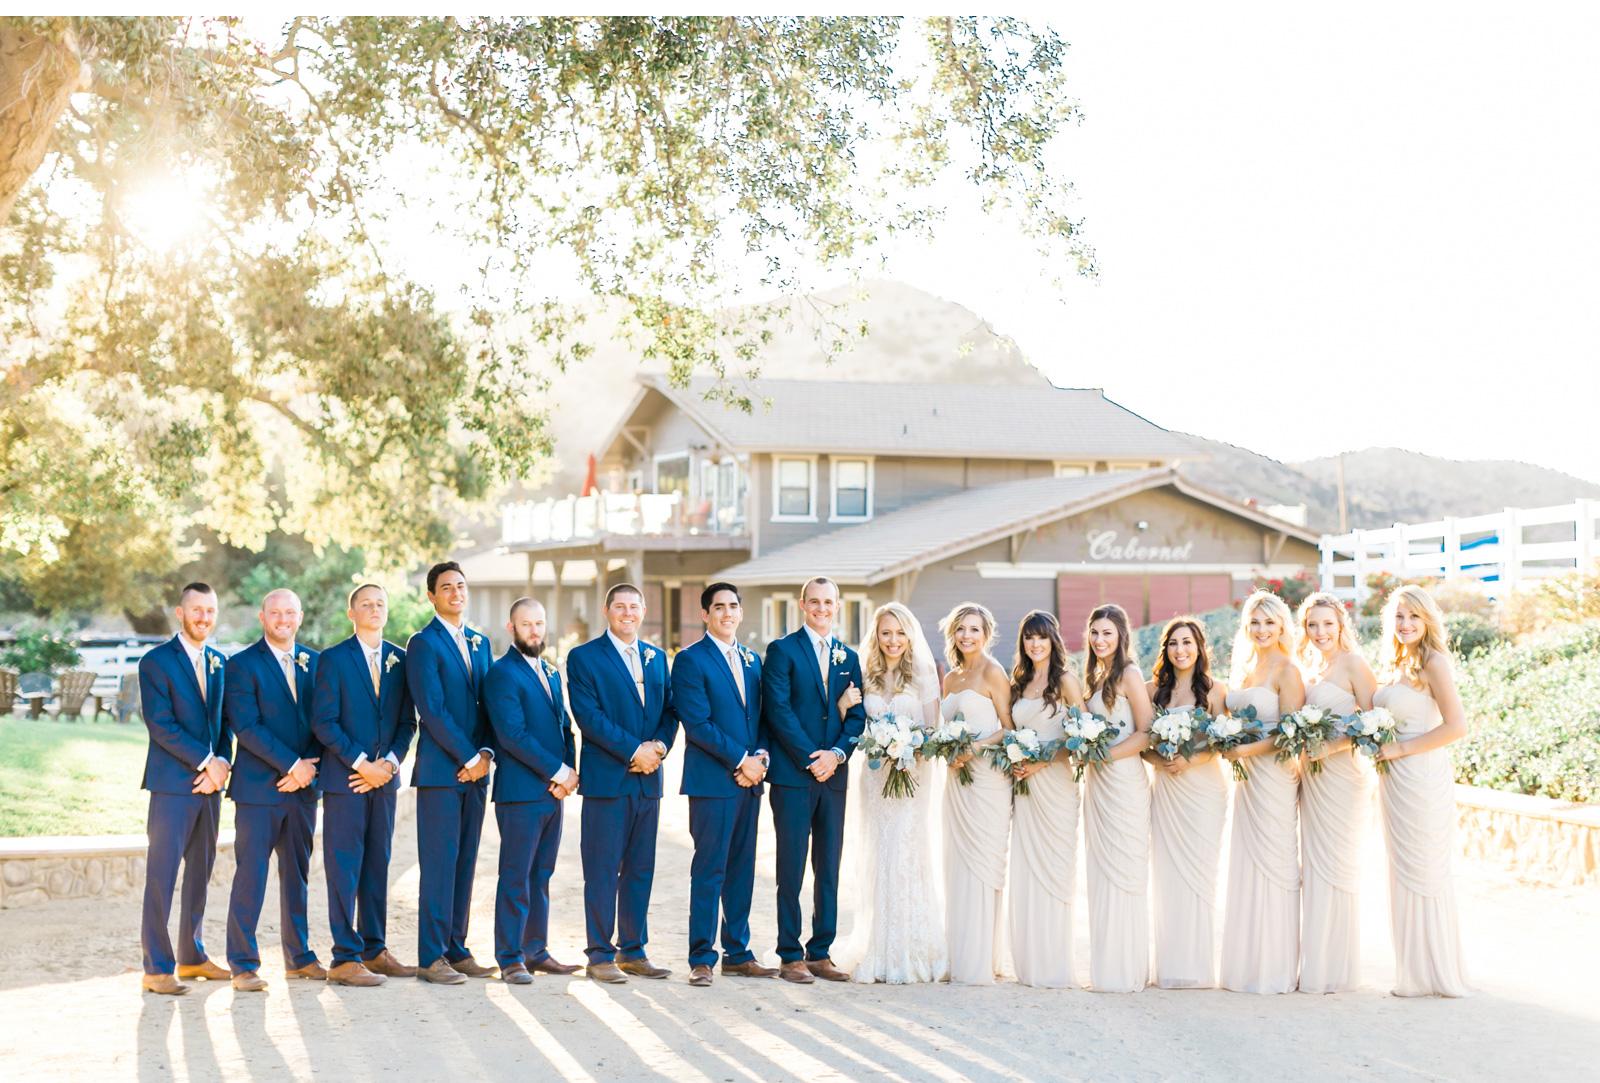 Style-Me-Pretty-Wedding-Photographer-Natalie-Schutt-Photography-Calfornia-San-Luis-Obispo_12.jpg